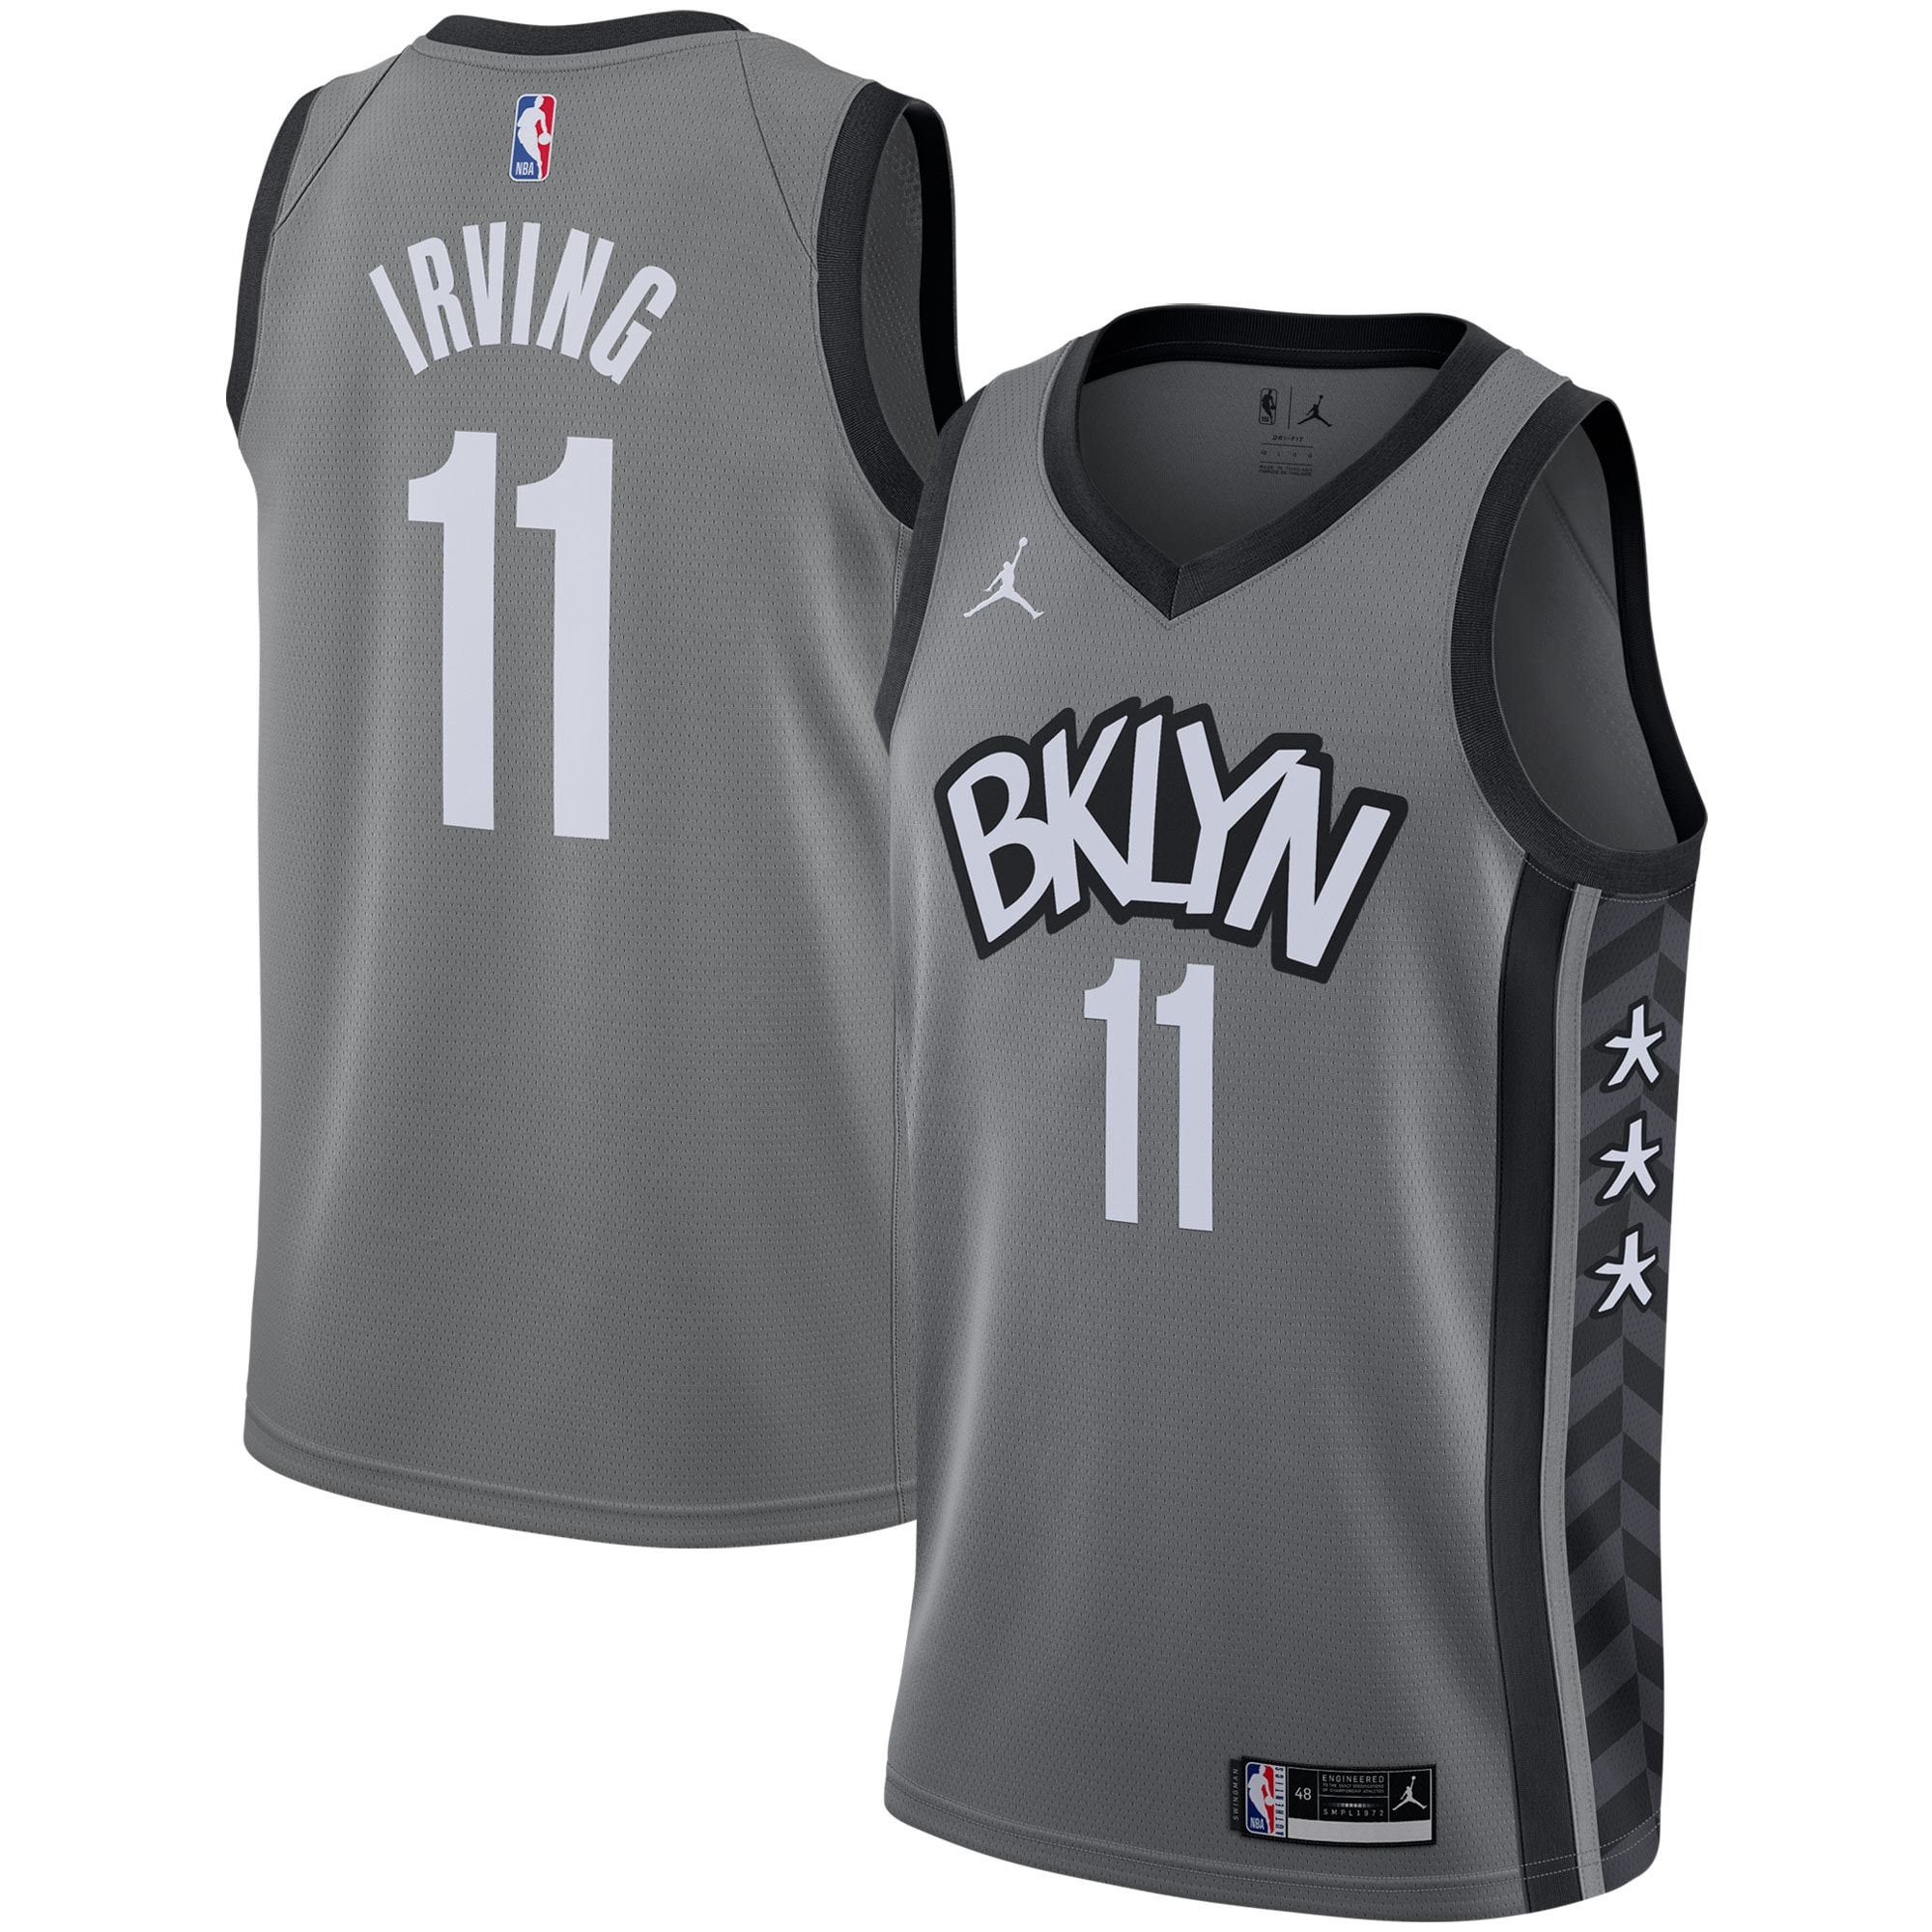 Kyrie Irving Brooklyn Nets Jordan Brand 2020/21 Swingman Jersey - Statement Edition - Gray